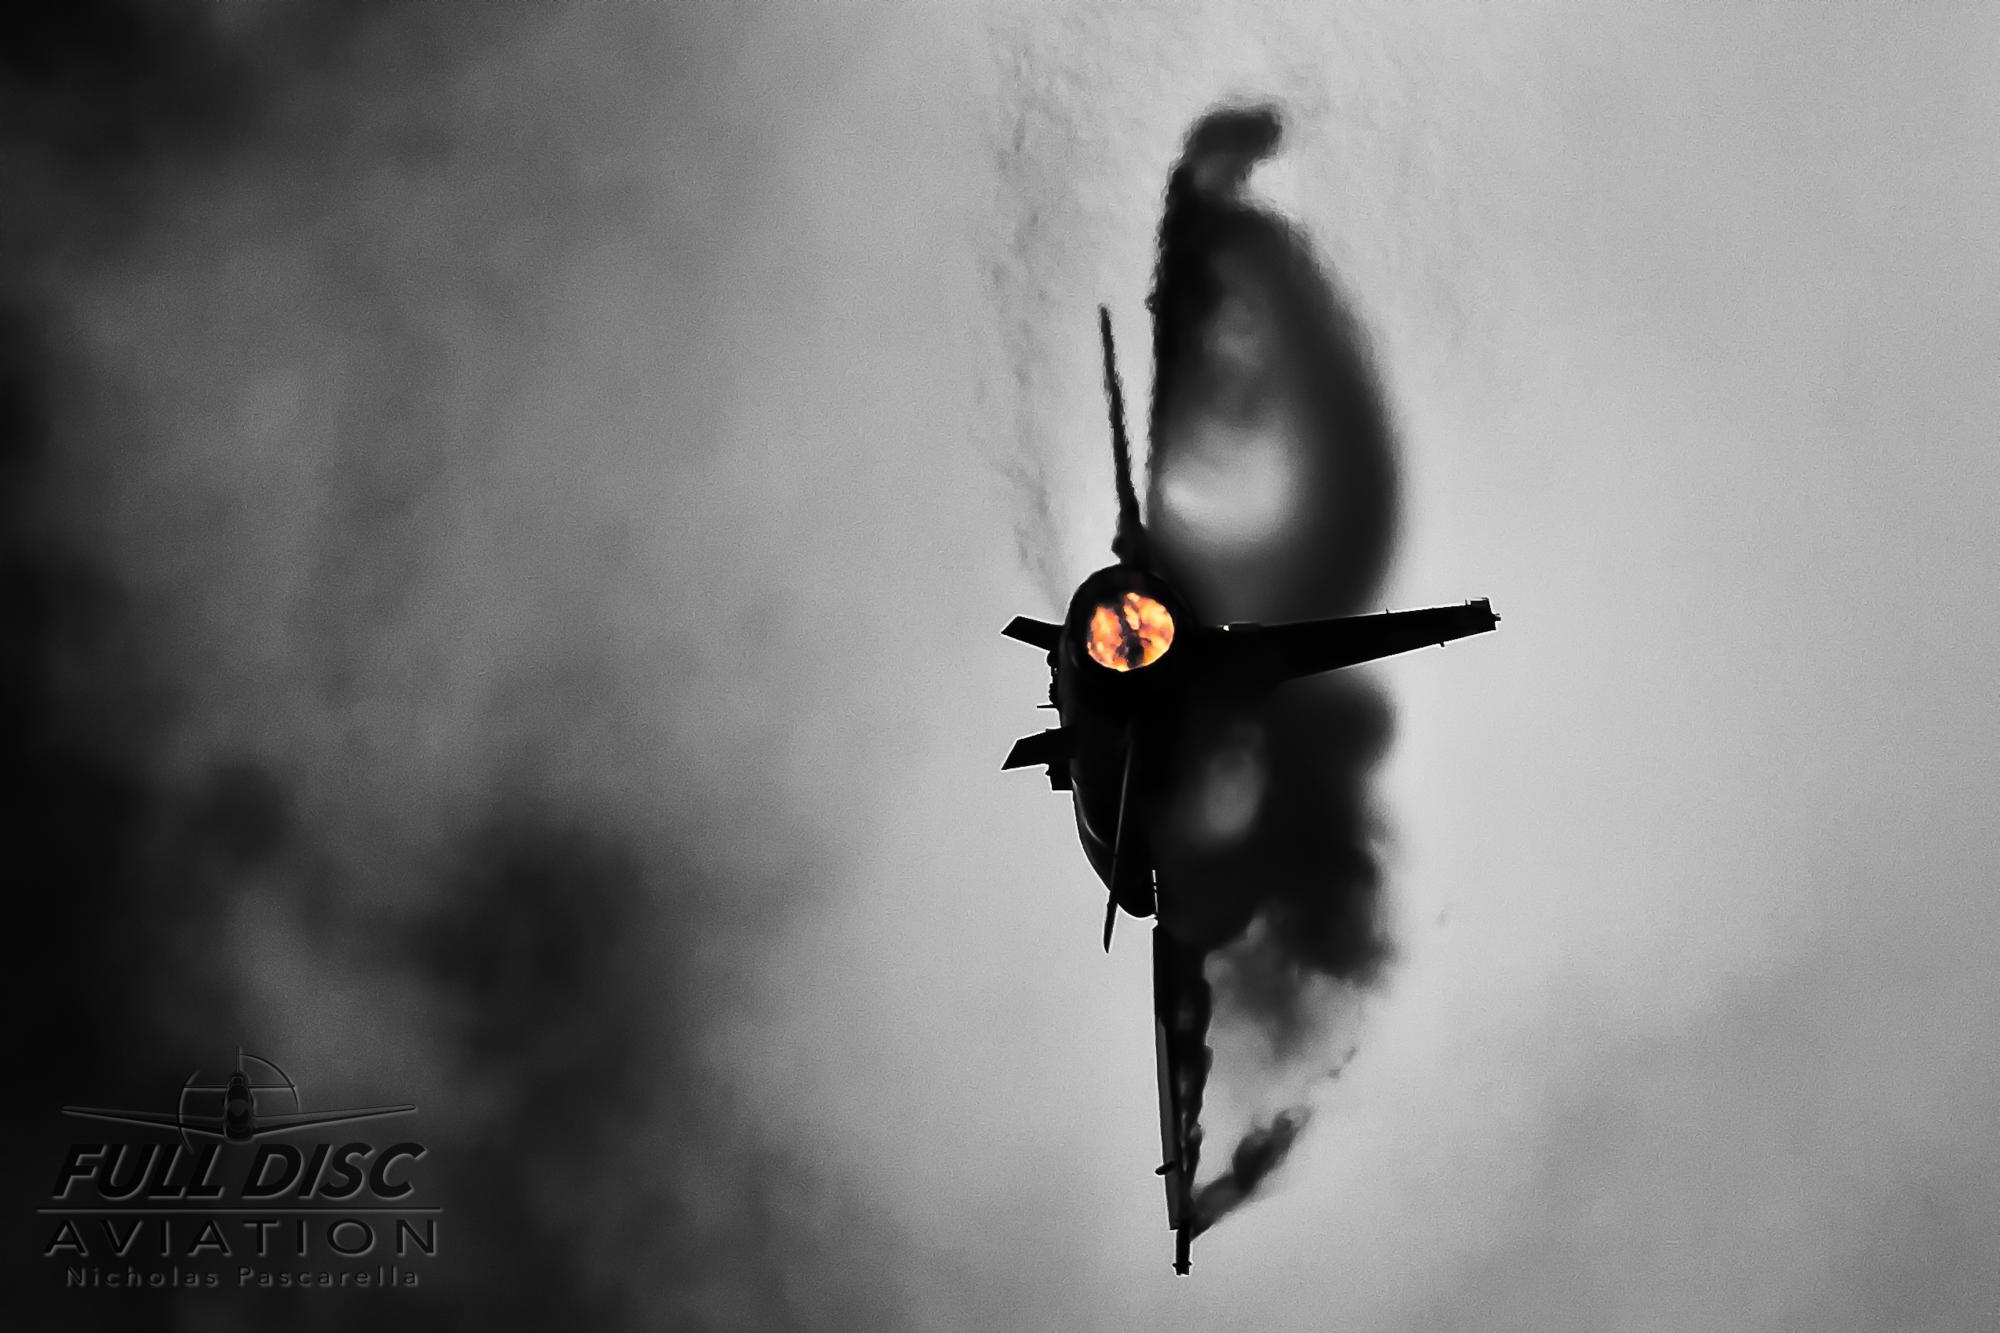 nickpascarella_nicholaspascarella_fulldiscaviation_aircraft_f16_turnandburn.jpg